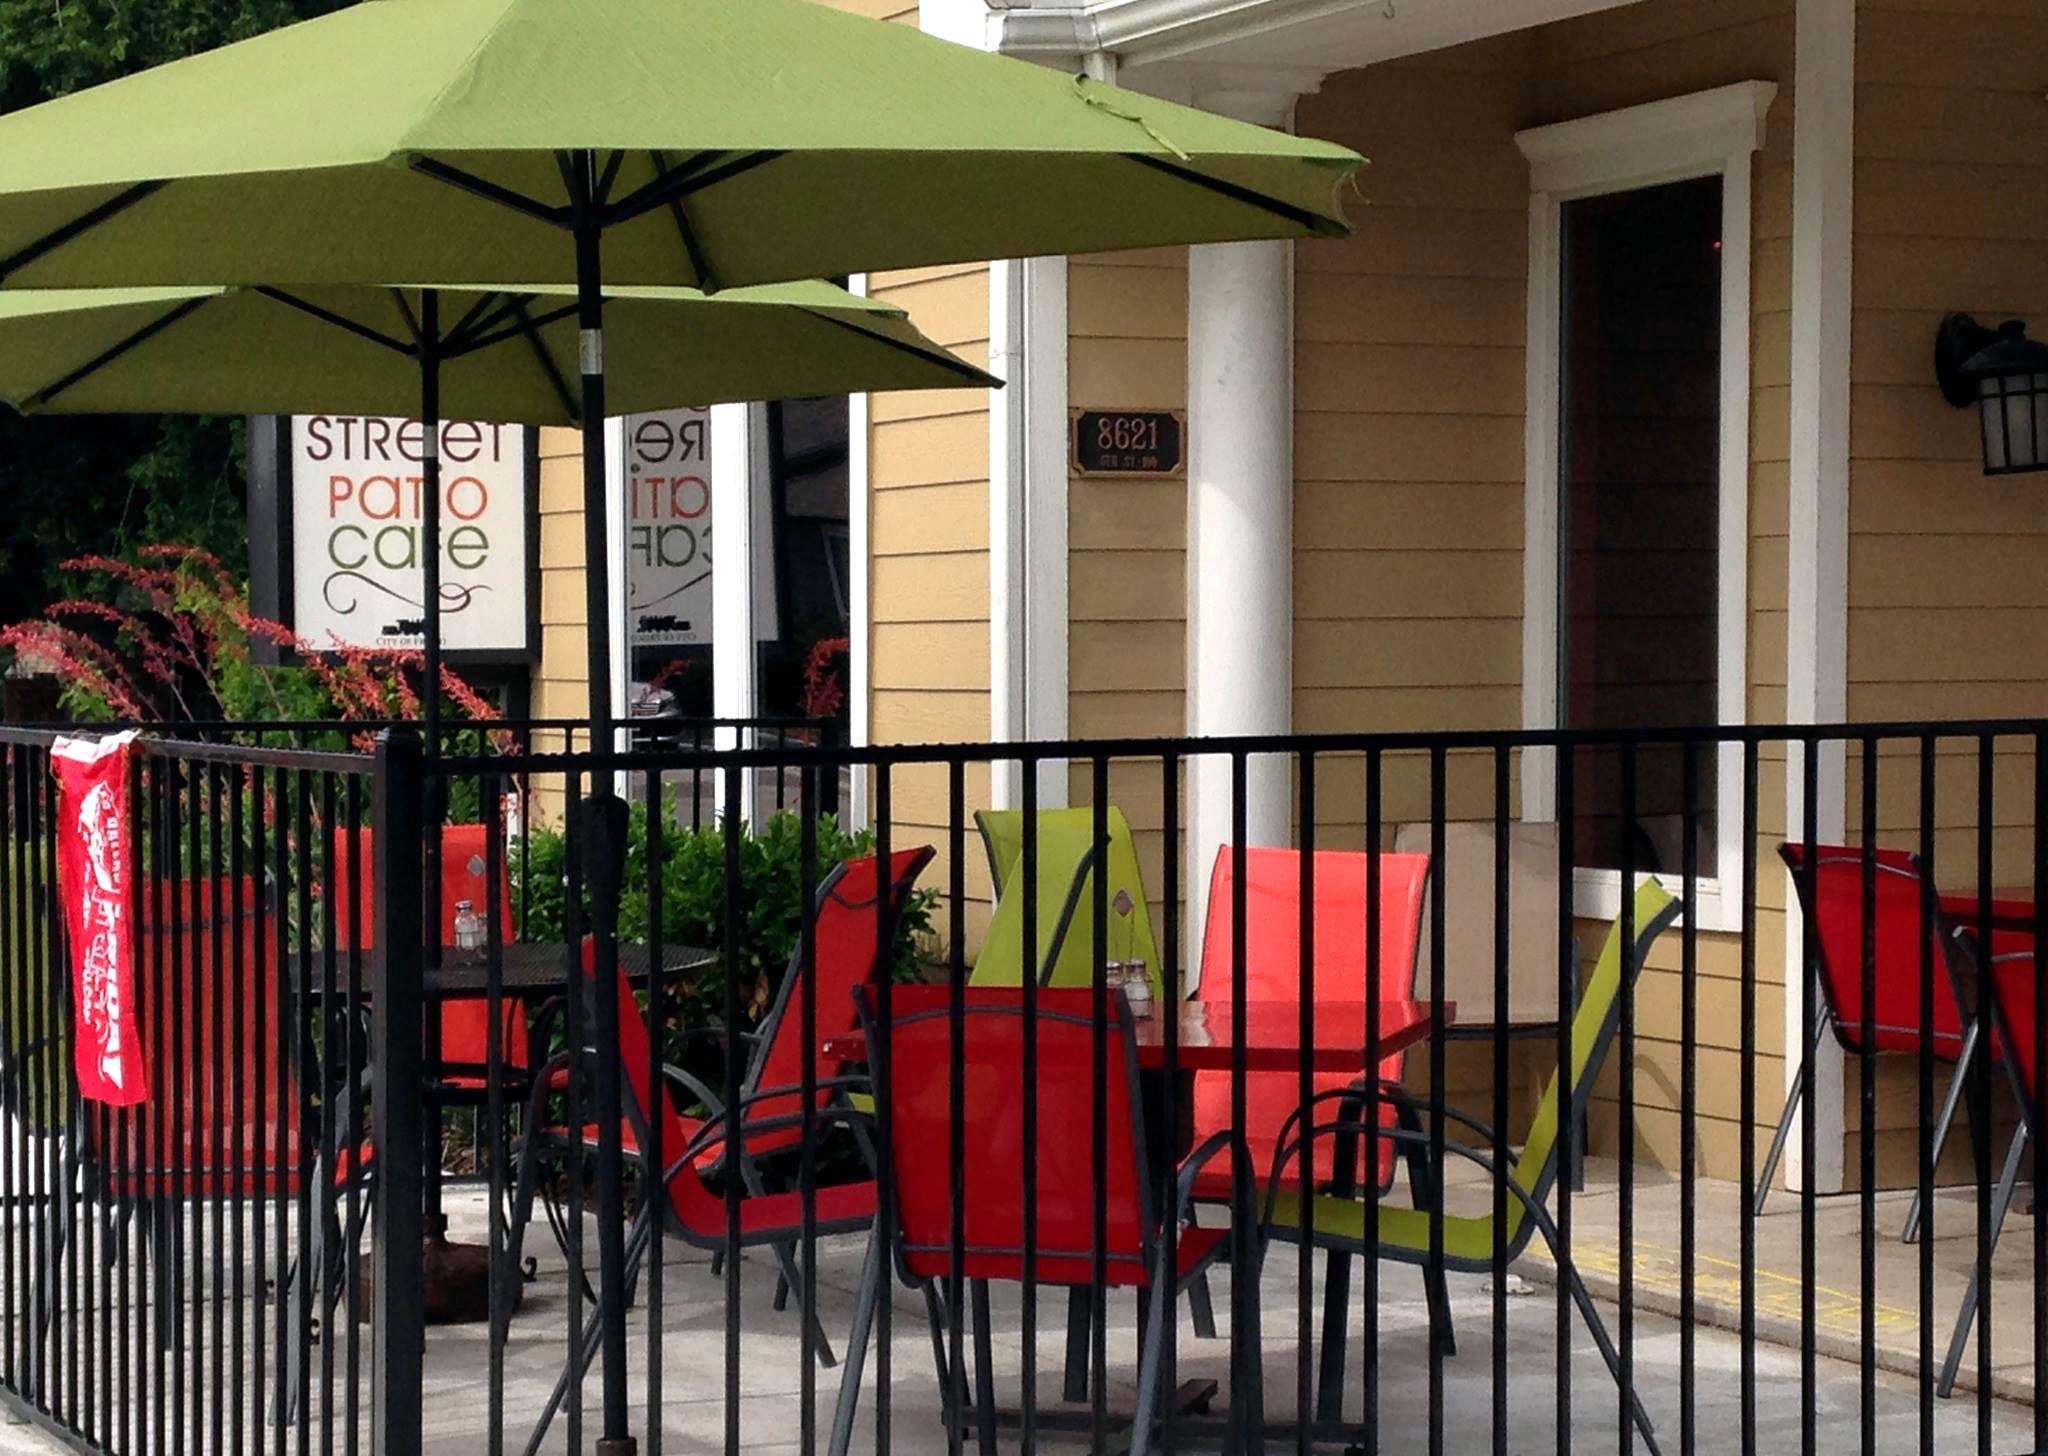 5th Street Patio Cafe